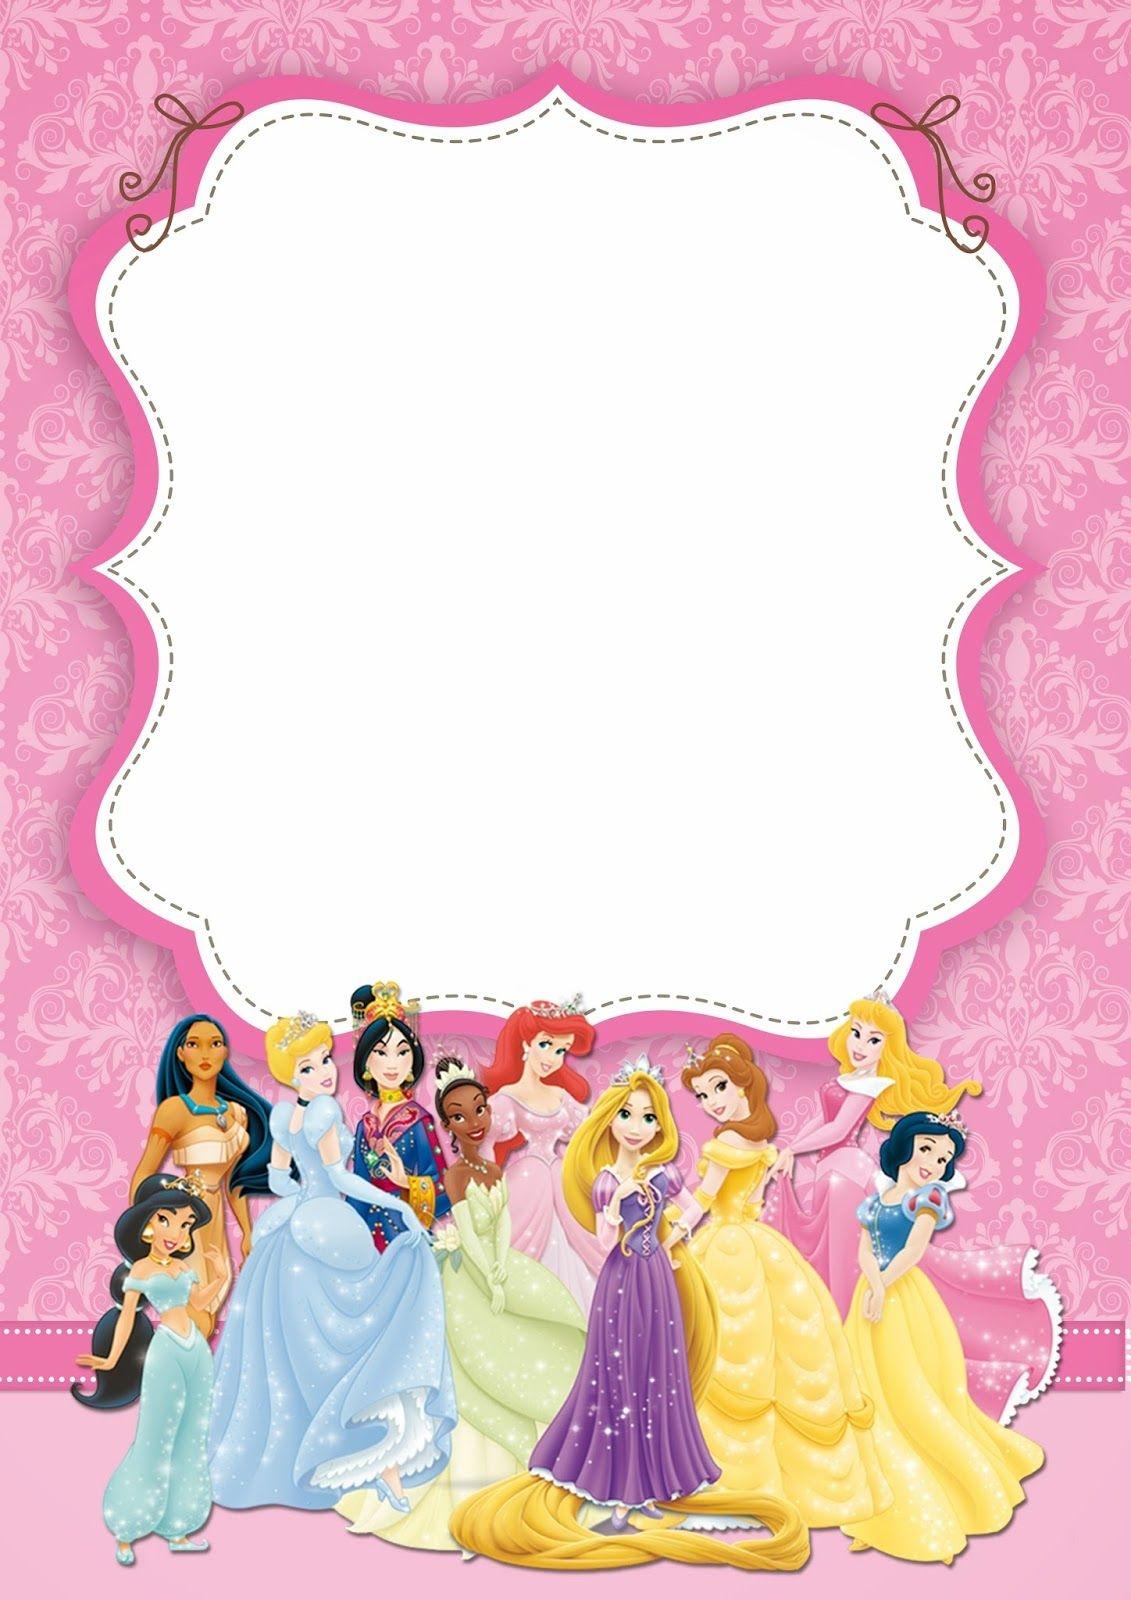 Disney Princess: Free Printable Party Invitations. | Princess - Disney Princess Free Printable Invitations